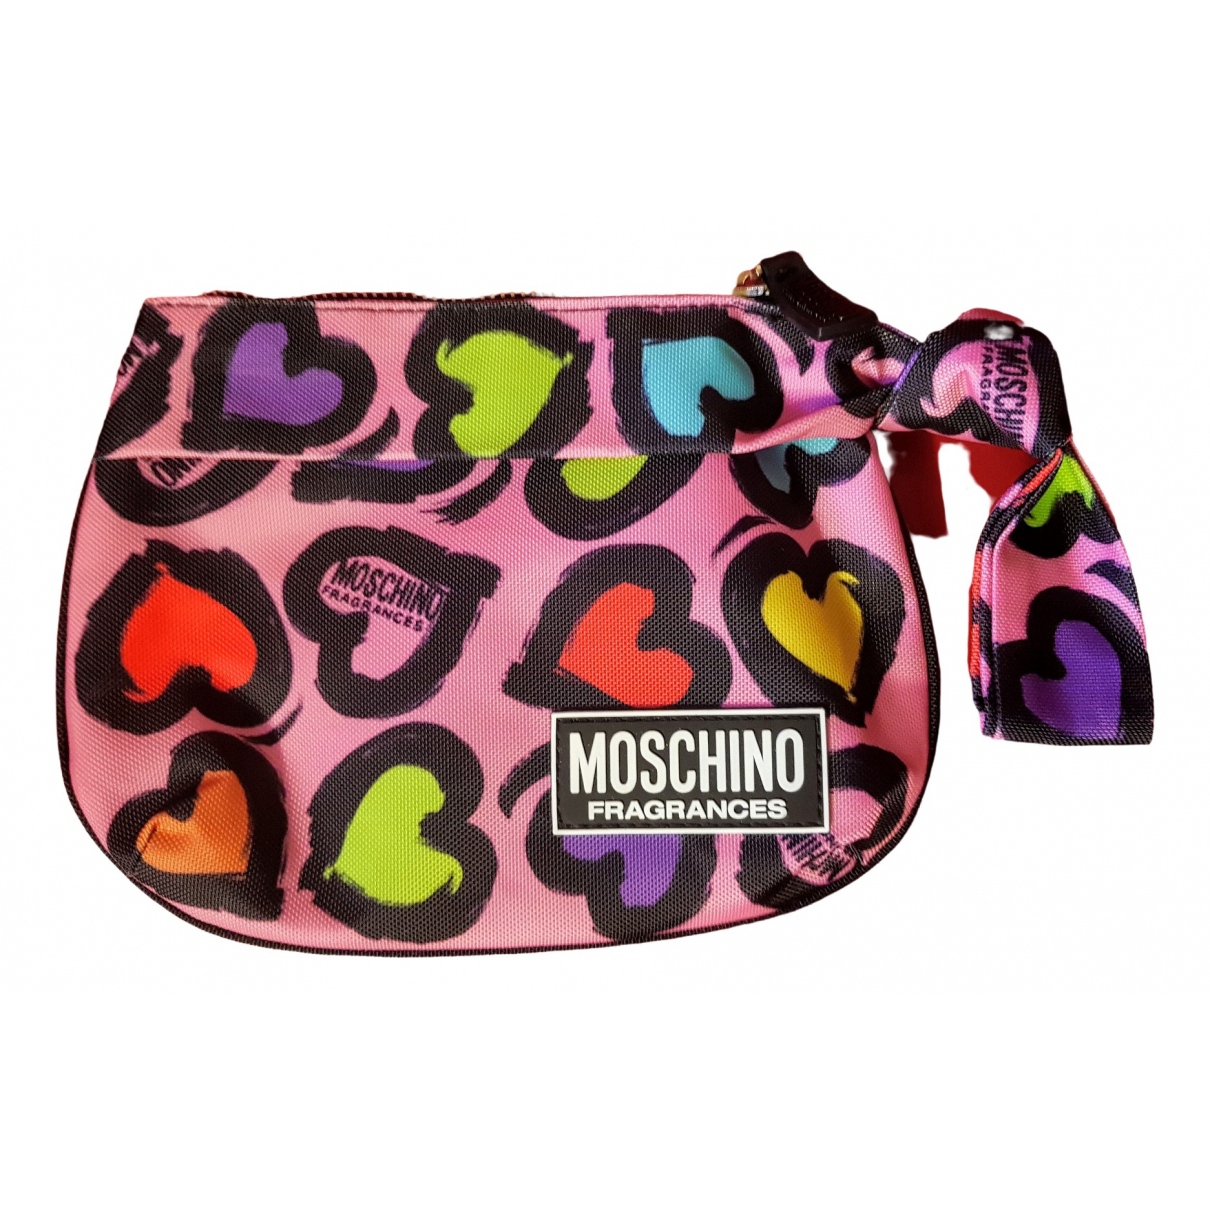 Moschino - Sac de voyage   pour femme - multicolore